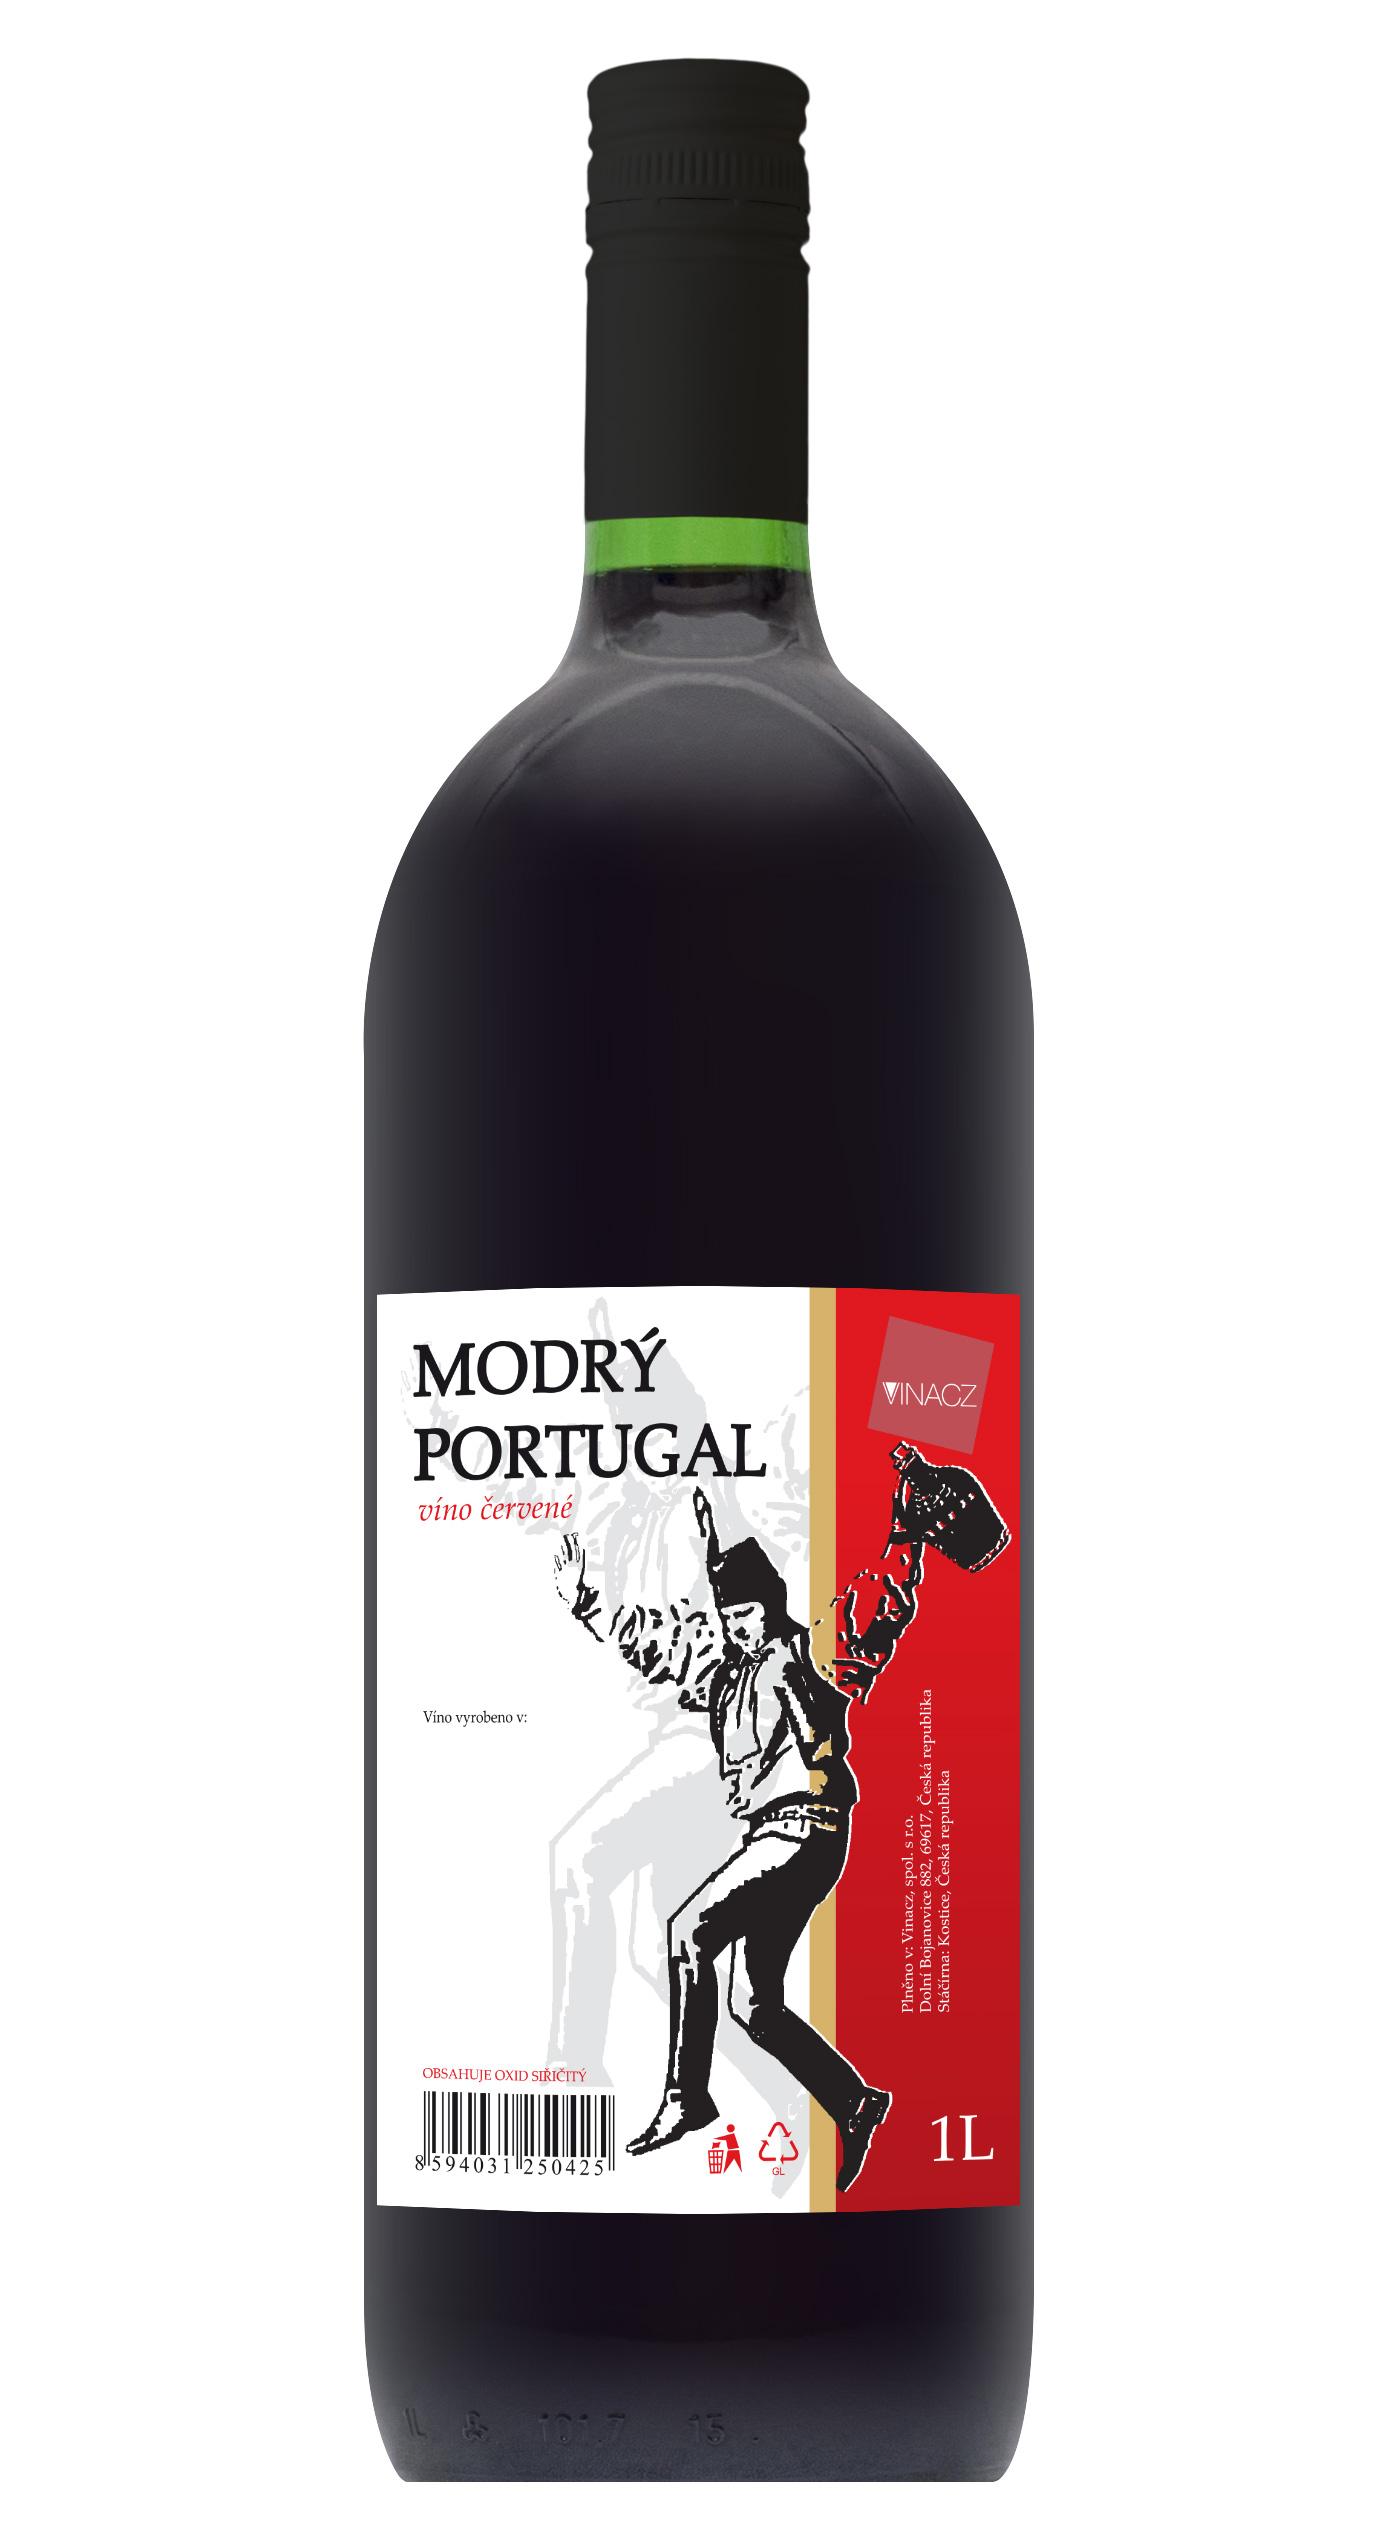 Modrý Portugal